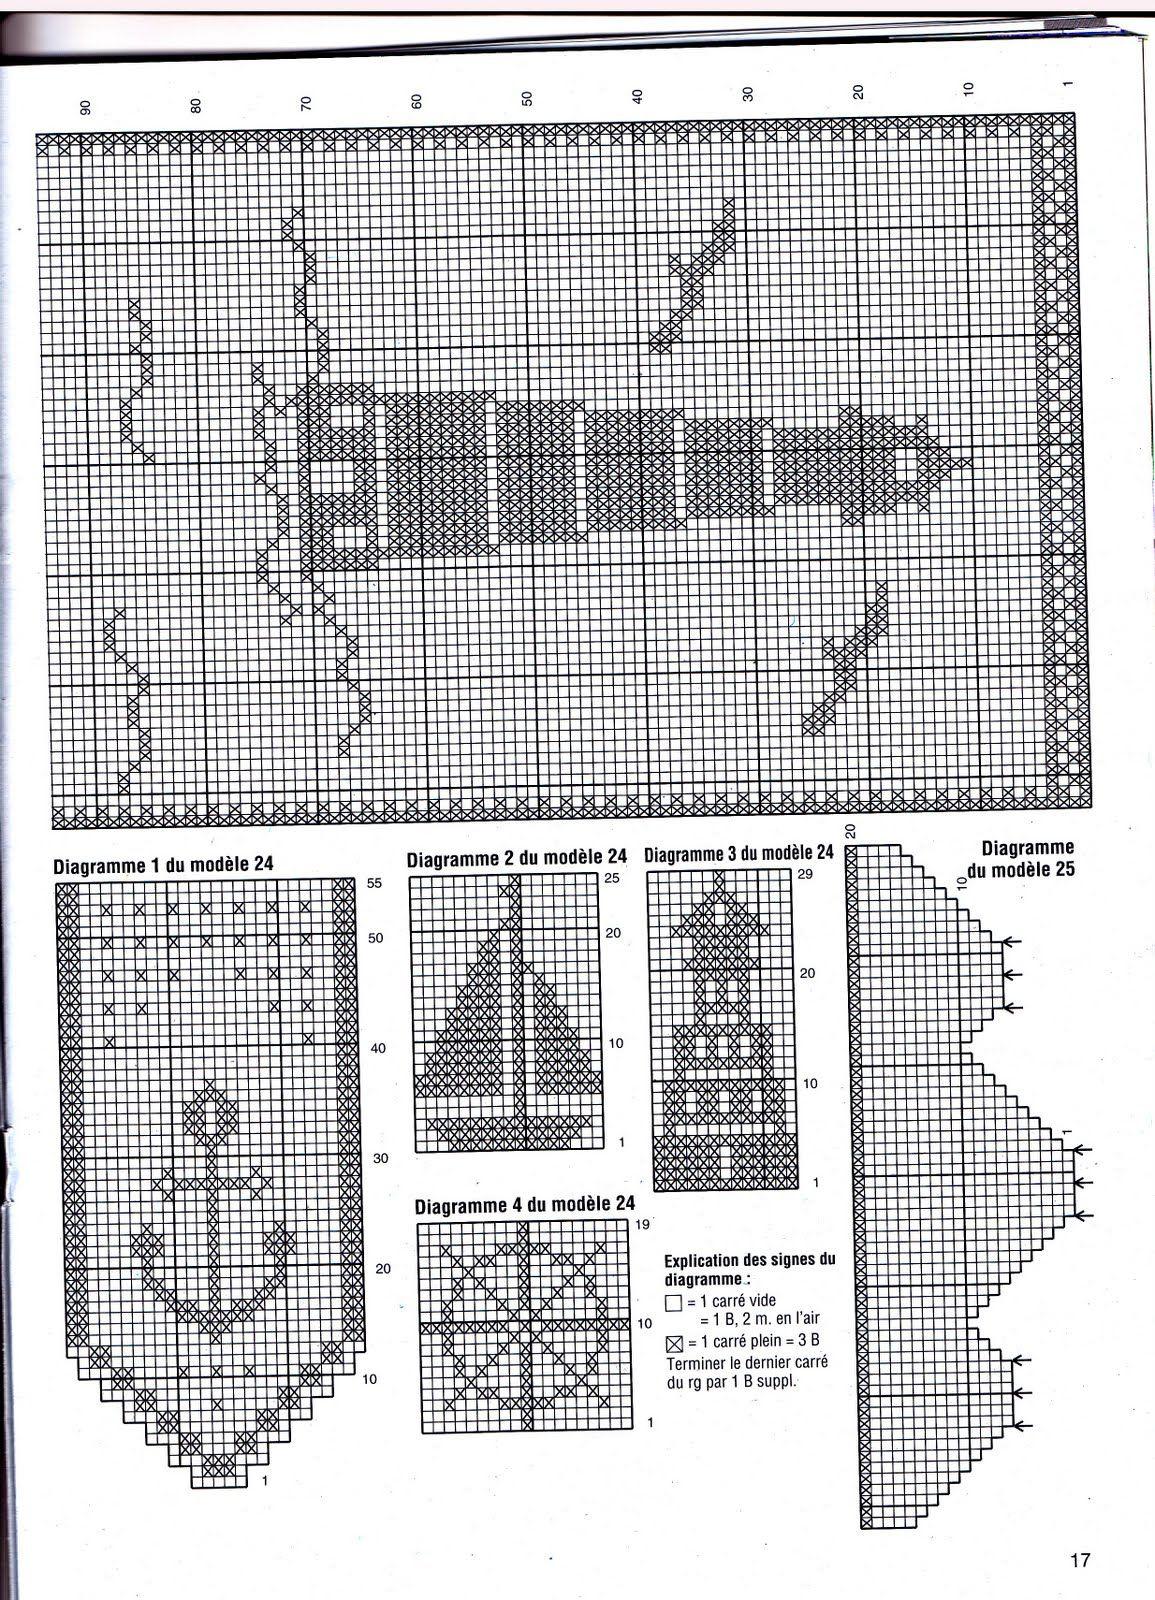 Full Size of Küchegardinen Häkeln Anleitung Szydekomania 12 01 2012 2013 Gardinen Hkeln Wohnzimmer Küchegardinen Häkeln Anleitung